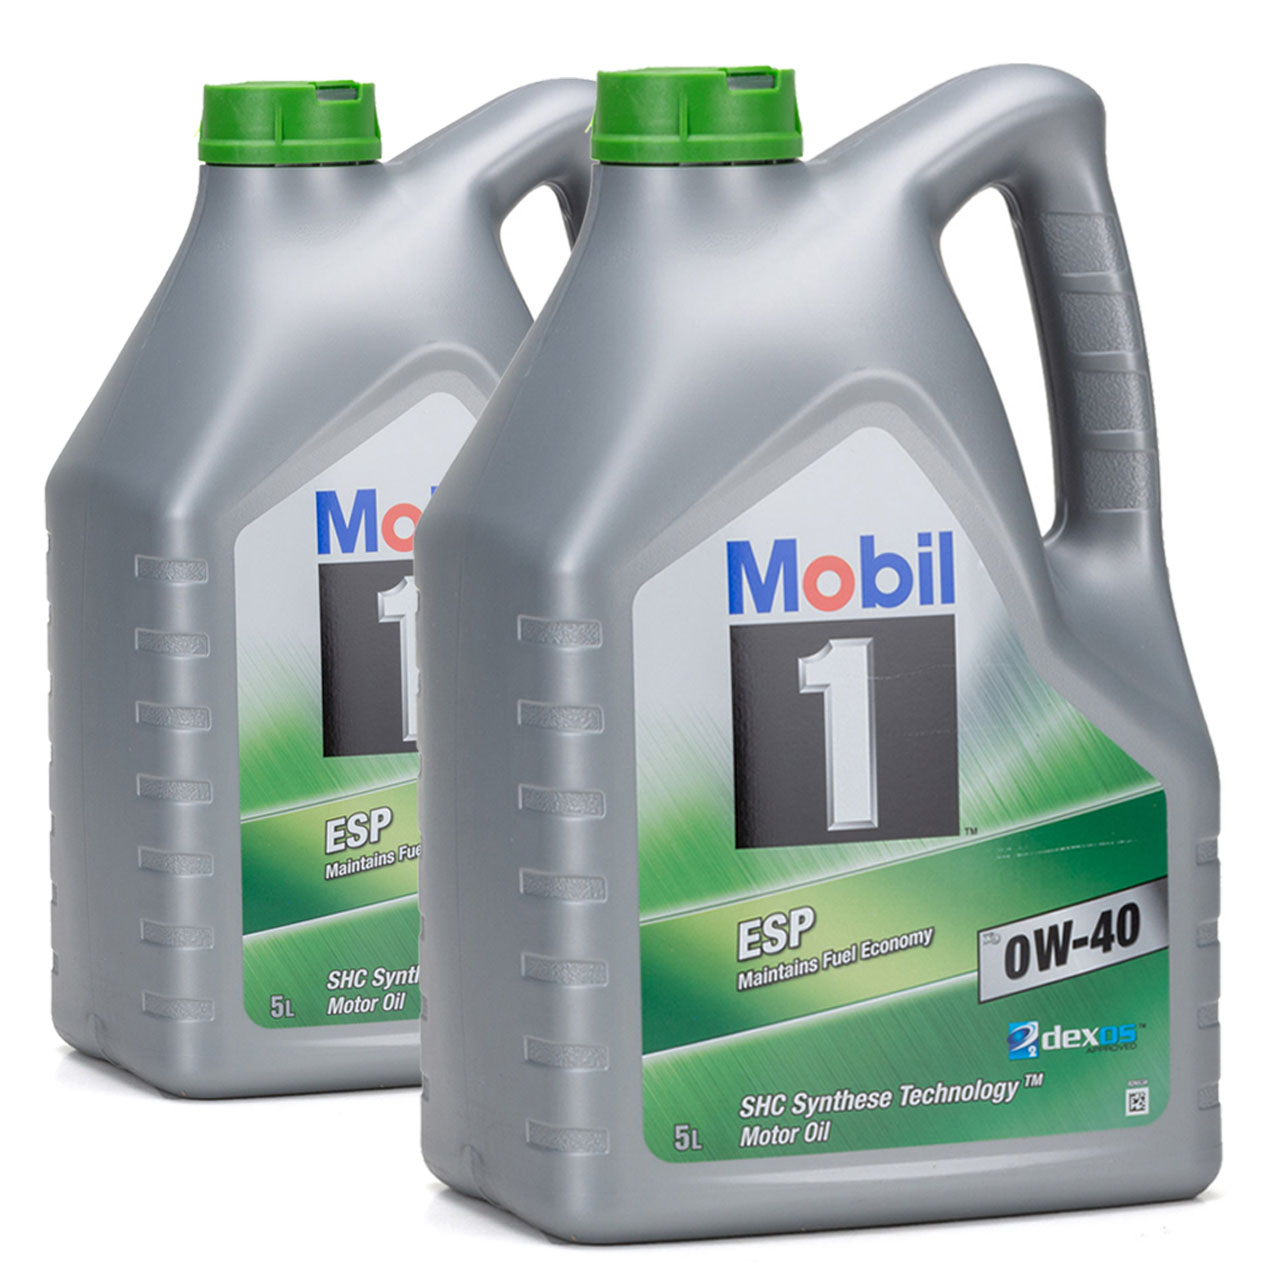 Mobil 1 ESP X3 C40 Motoröl Öl 0W-40 0W40 dexos2 PORSCHE C40 VW 511.00 - 10 Liter